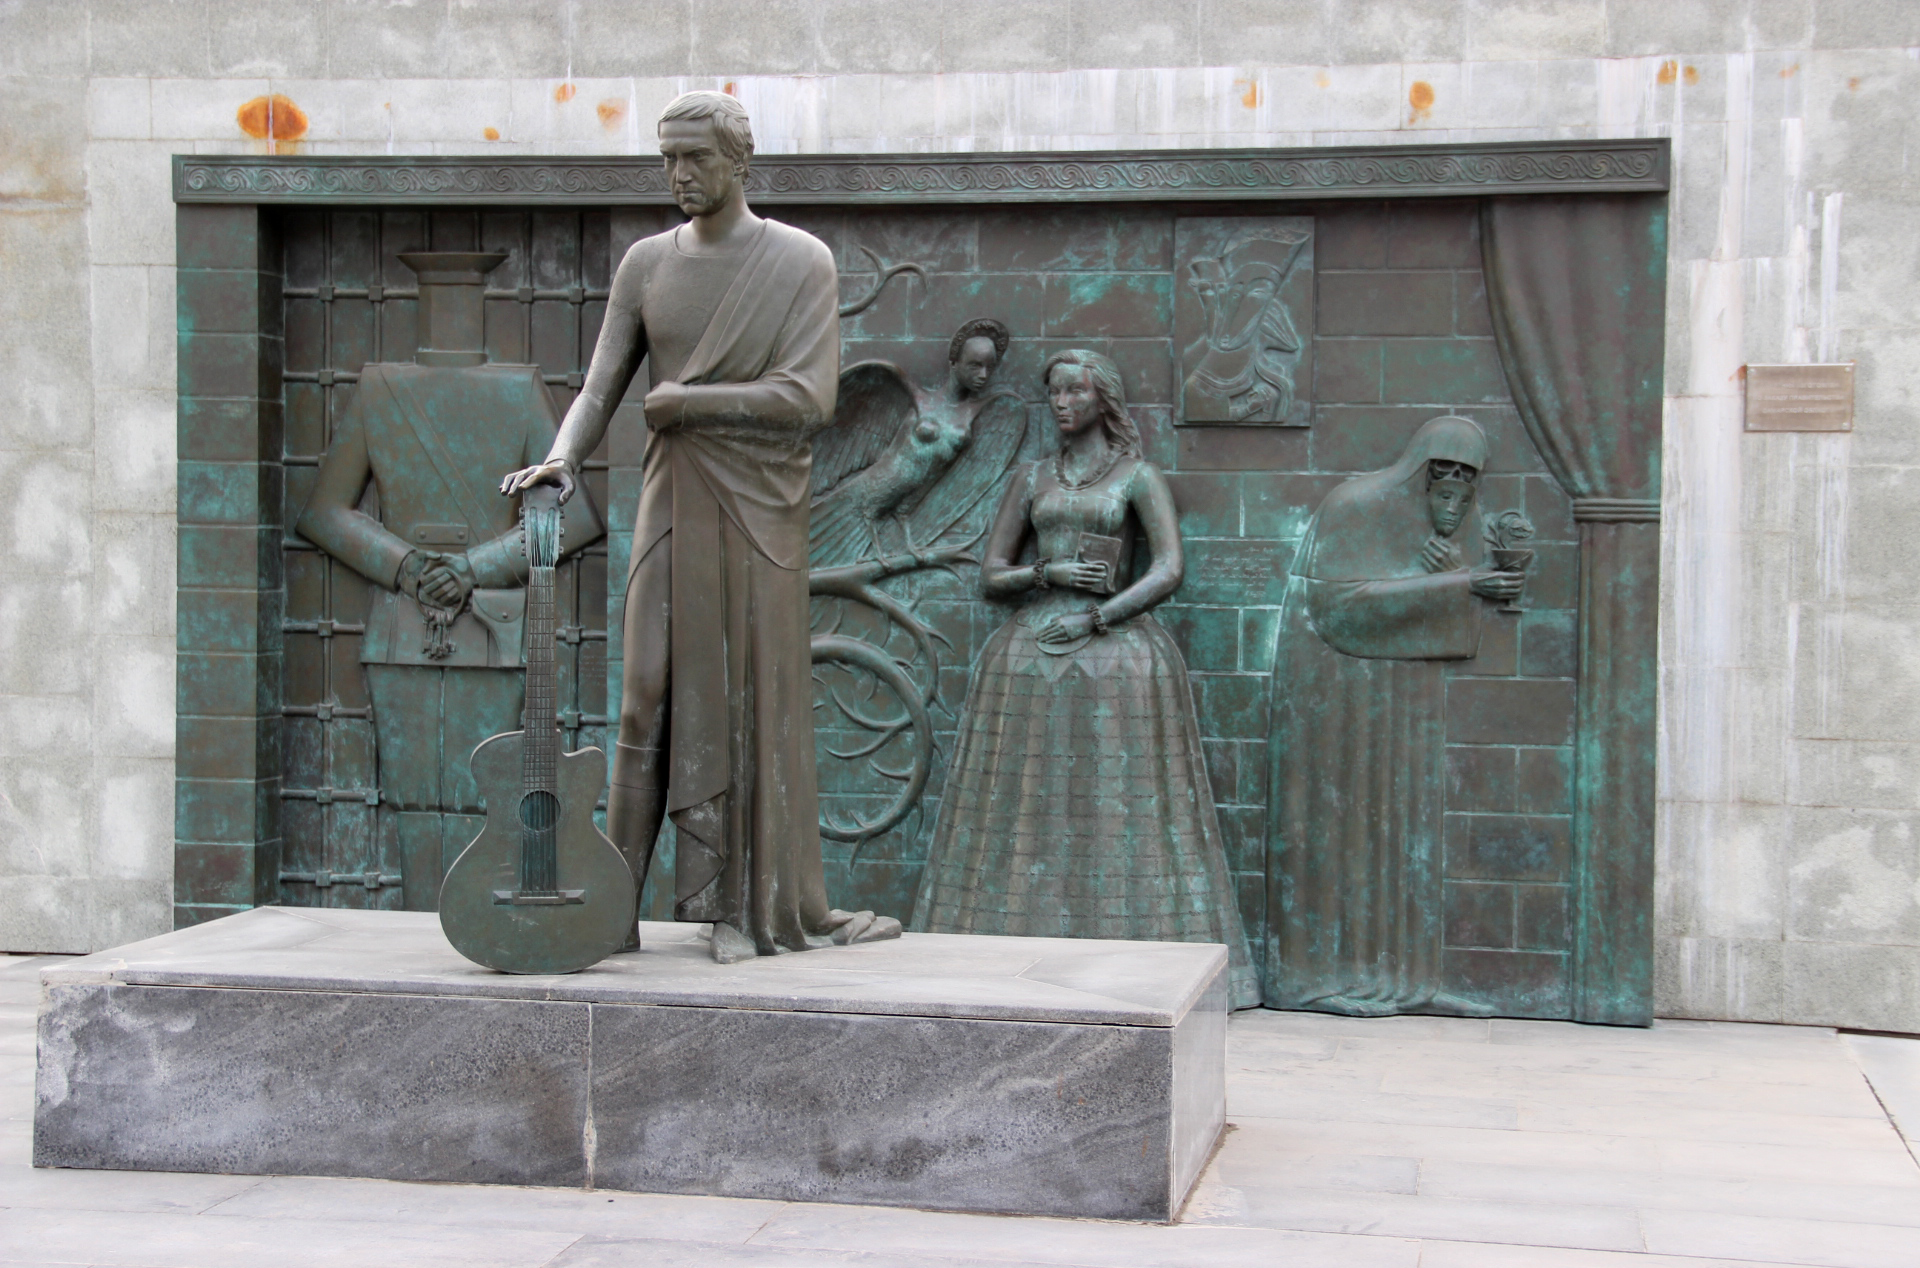 Vysotsky memorial in Samara, Russia. Image credit: Yuri Vantsev.